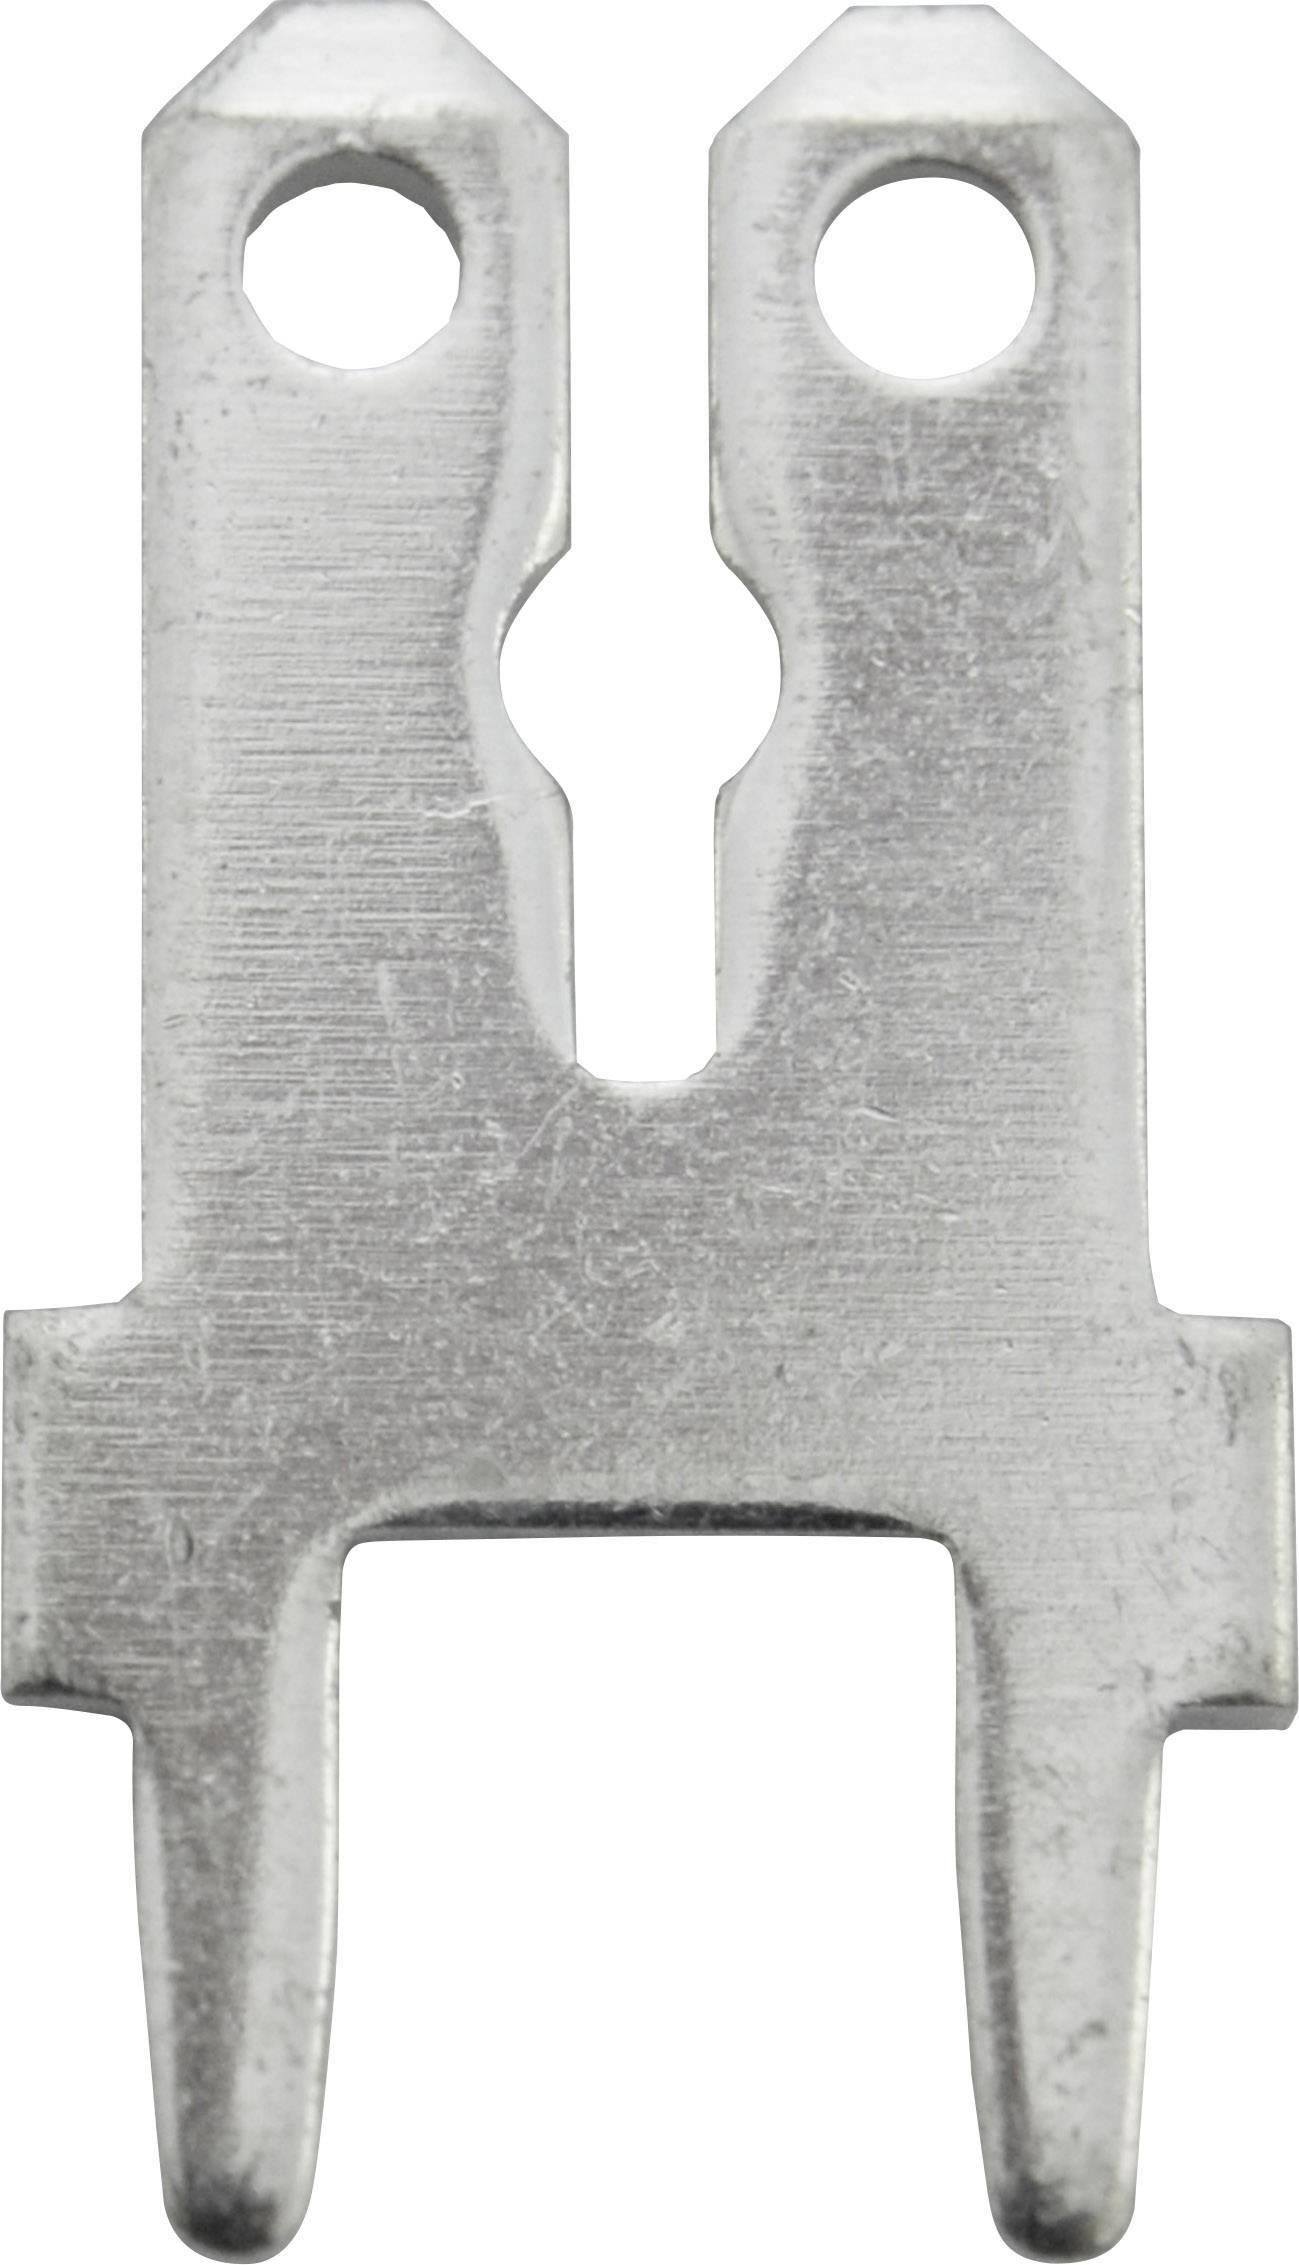 Faston zástrčka Vogt Verbindungstechnik 3866c.61 6.3 mm x 0.8 mm, 180 °, bez izolace, kov, 100 ks